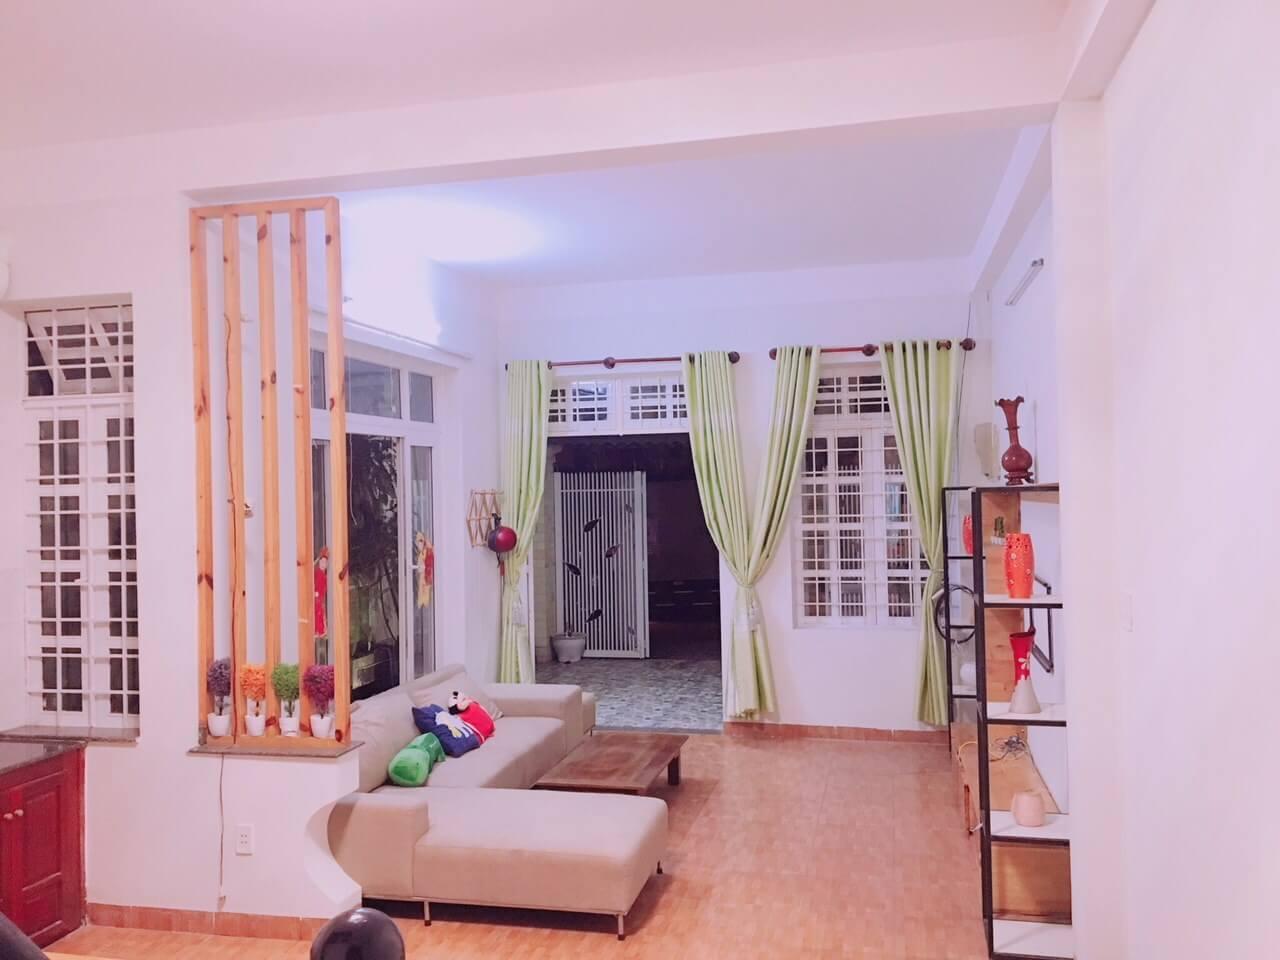 The house 3 bedrooms near An Hai Bac Market – 2010